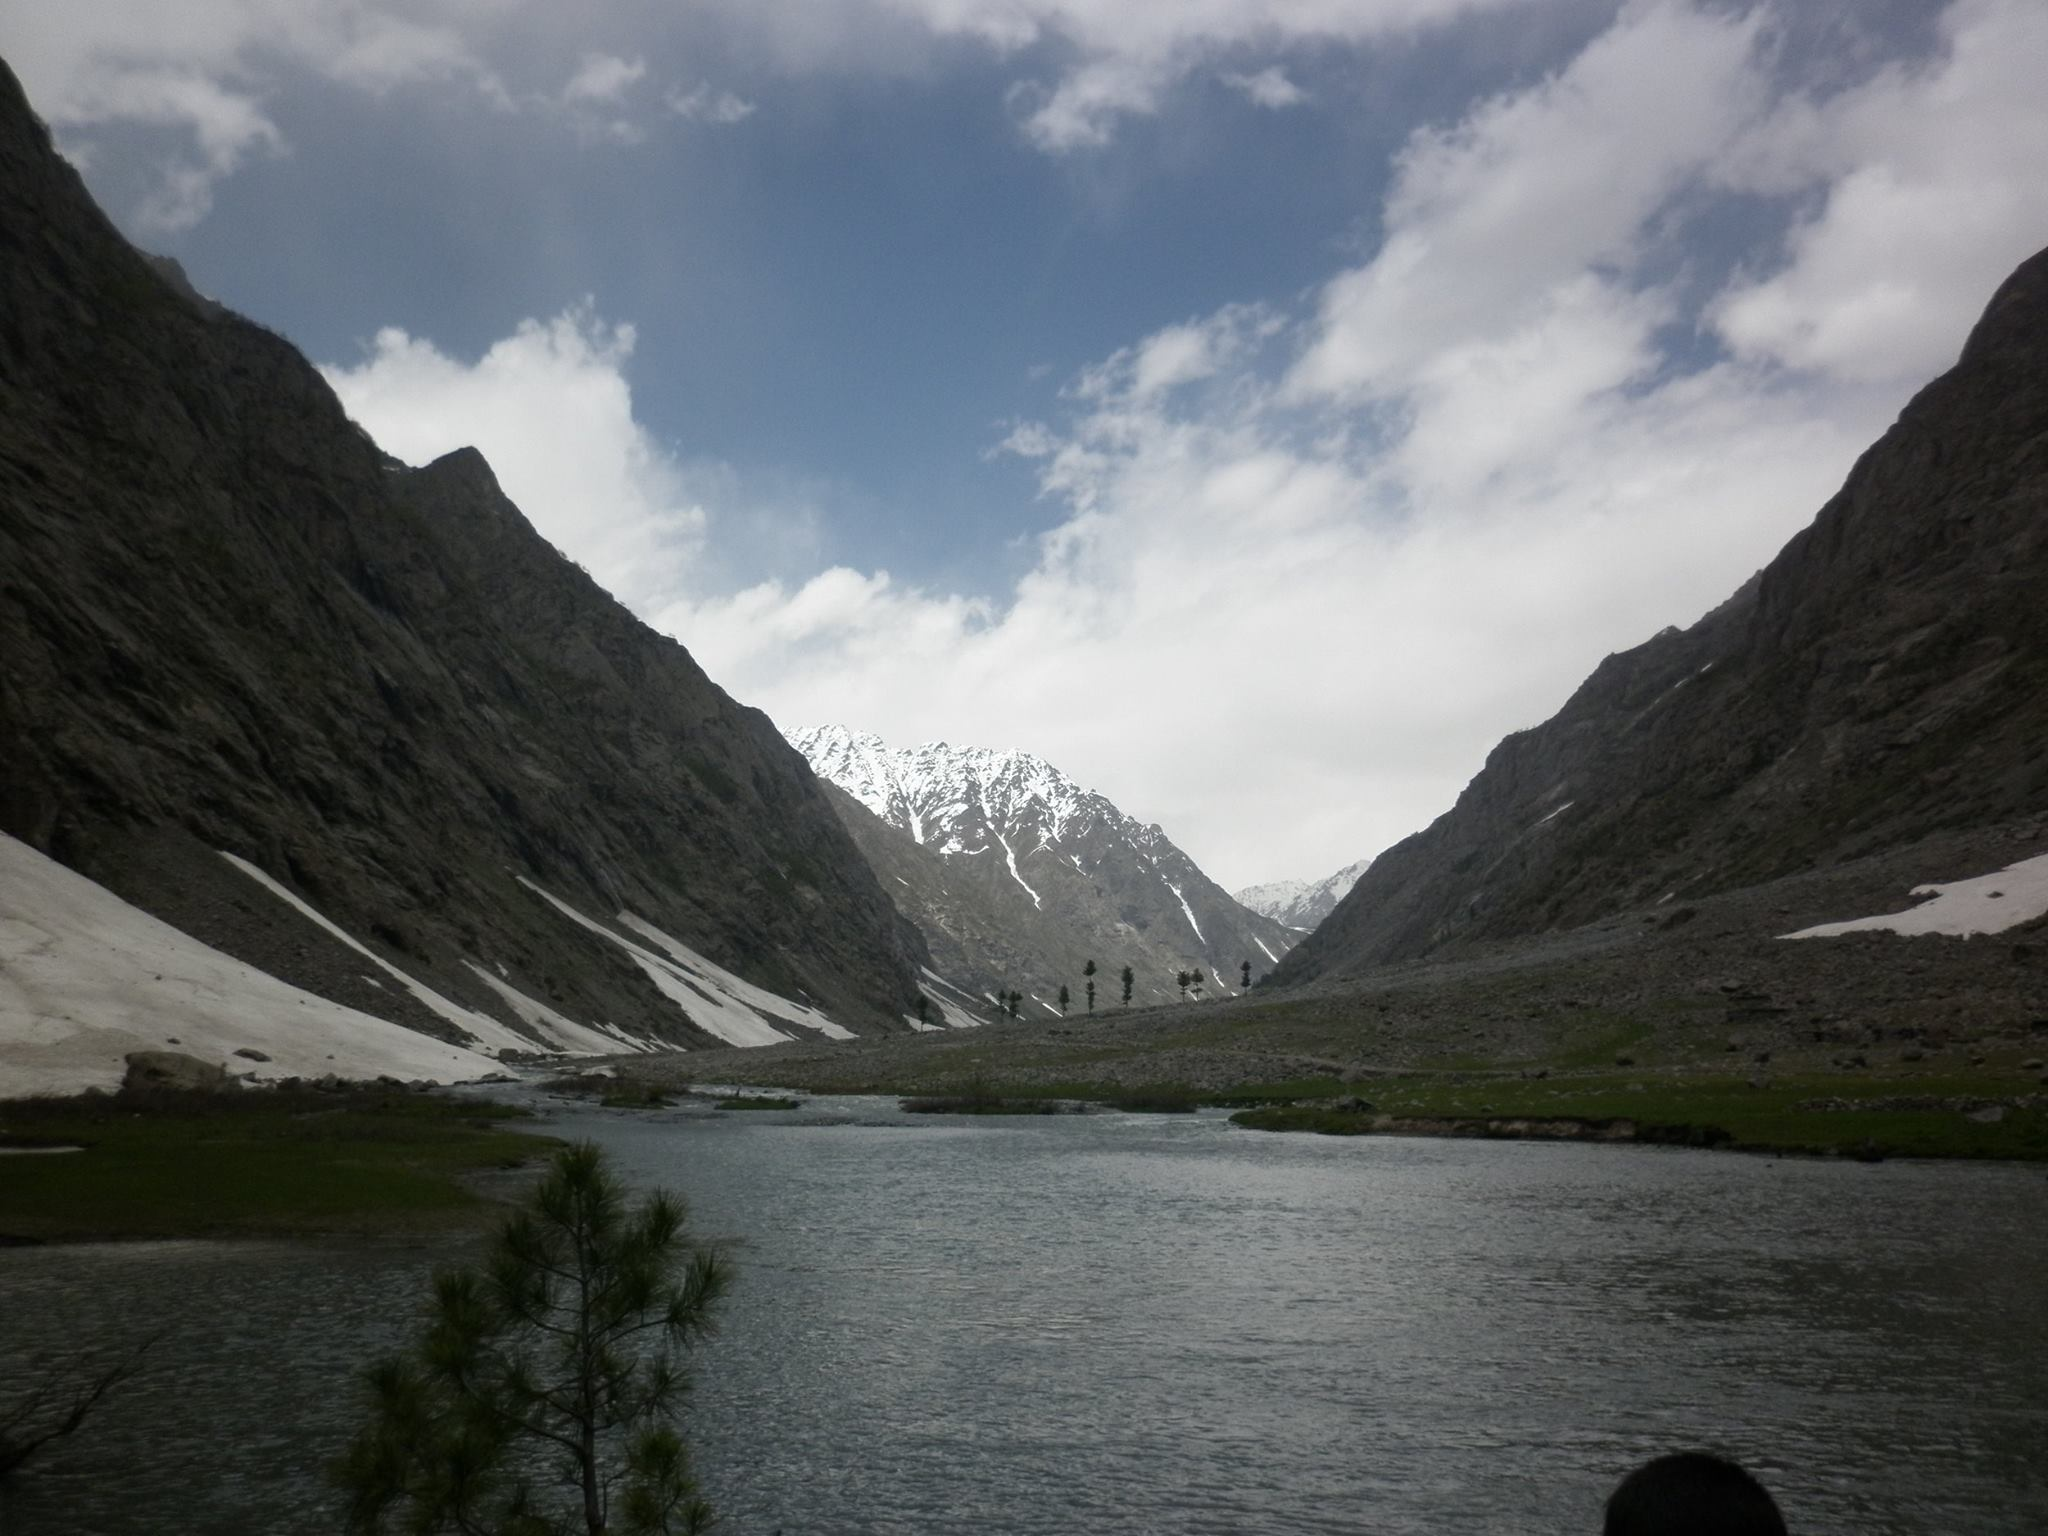 File:Mhodand, 40 km from kalam, Ushu valley swat.jpg